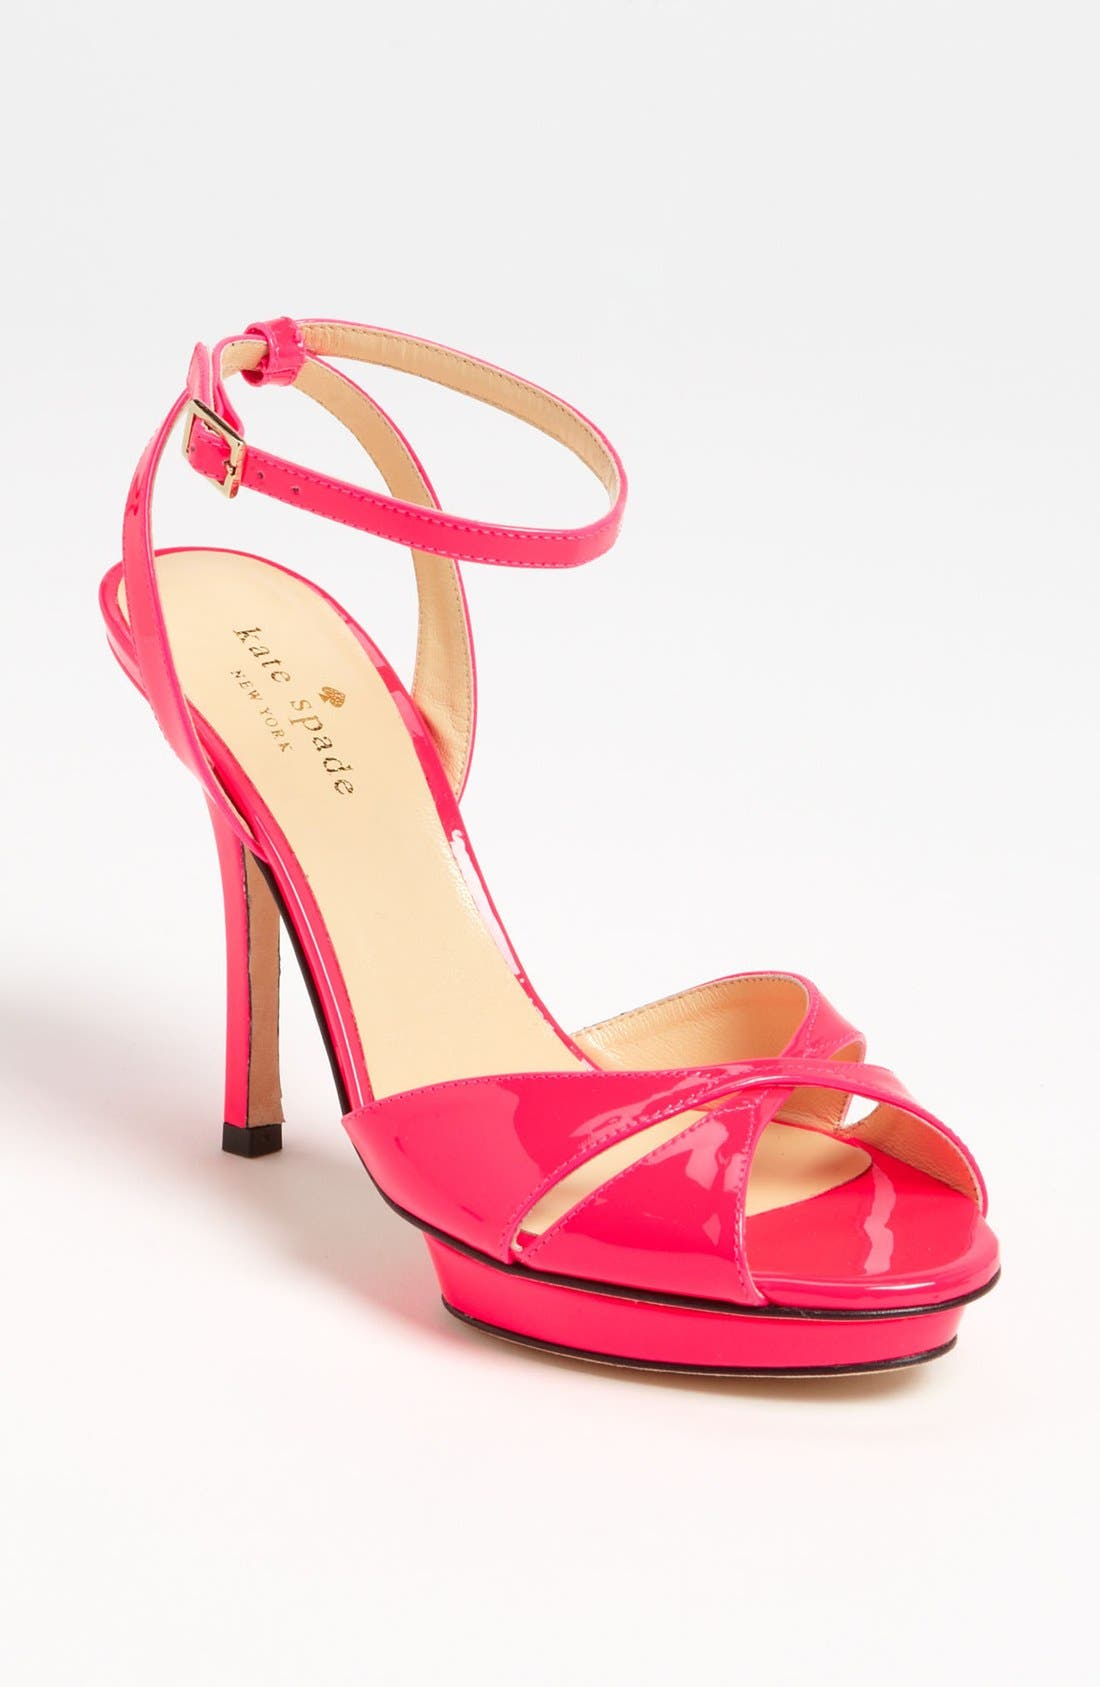 Main Image - kate spade new york 'verocity' sandal